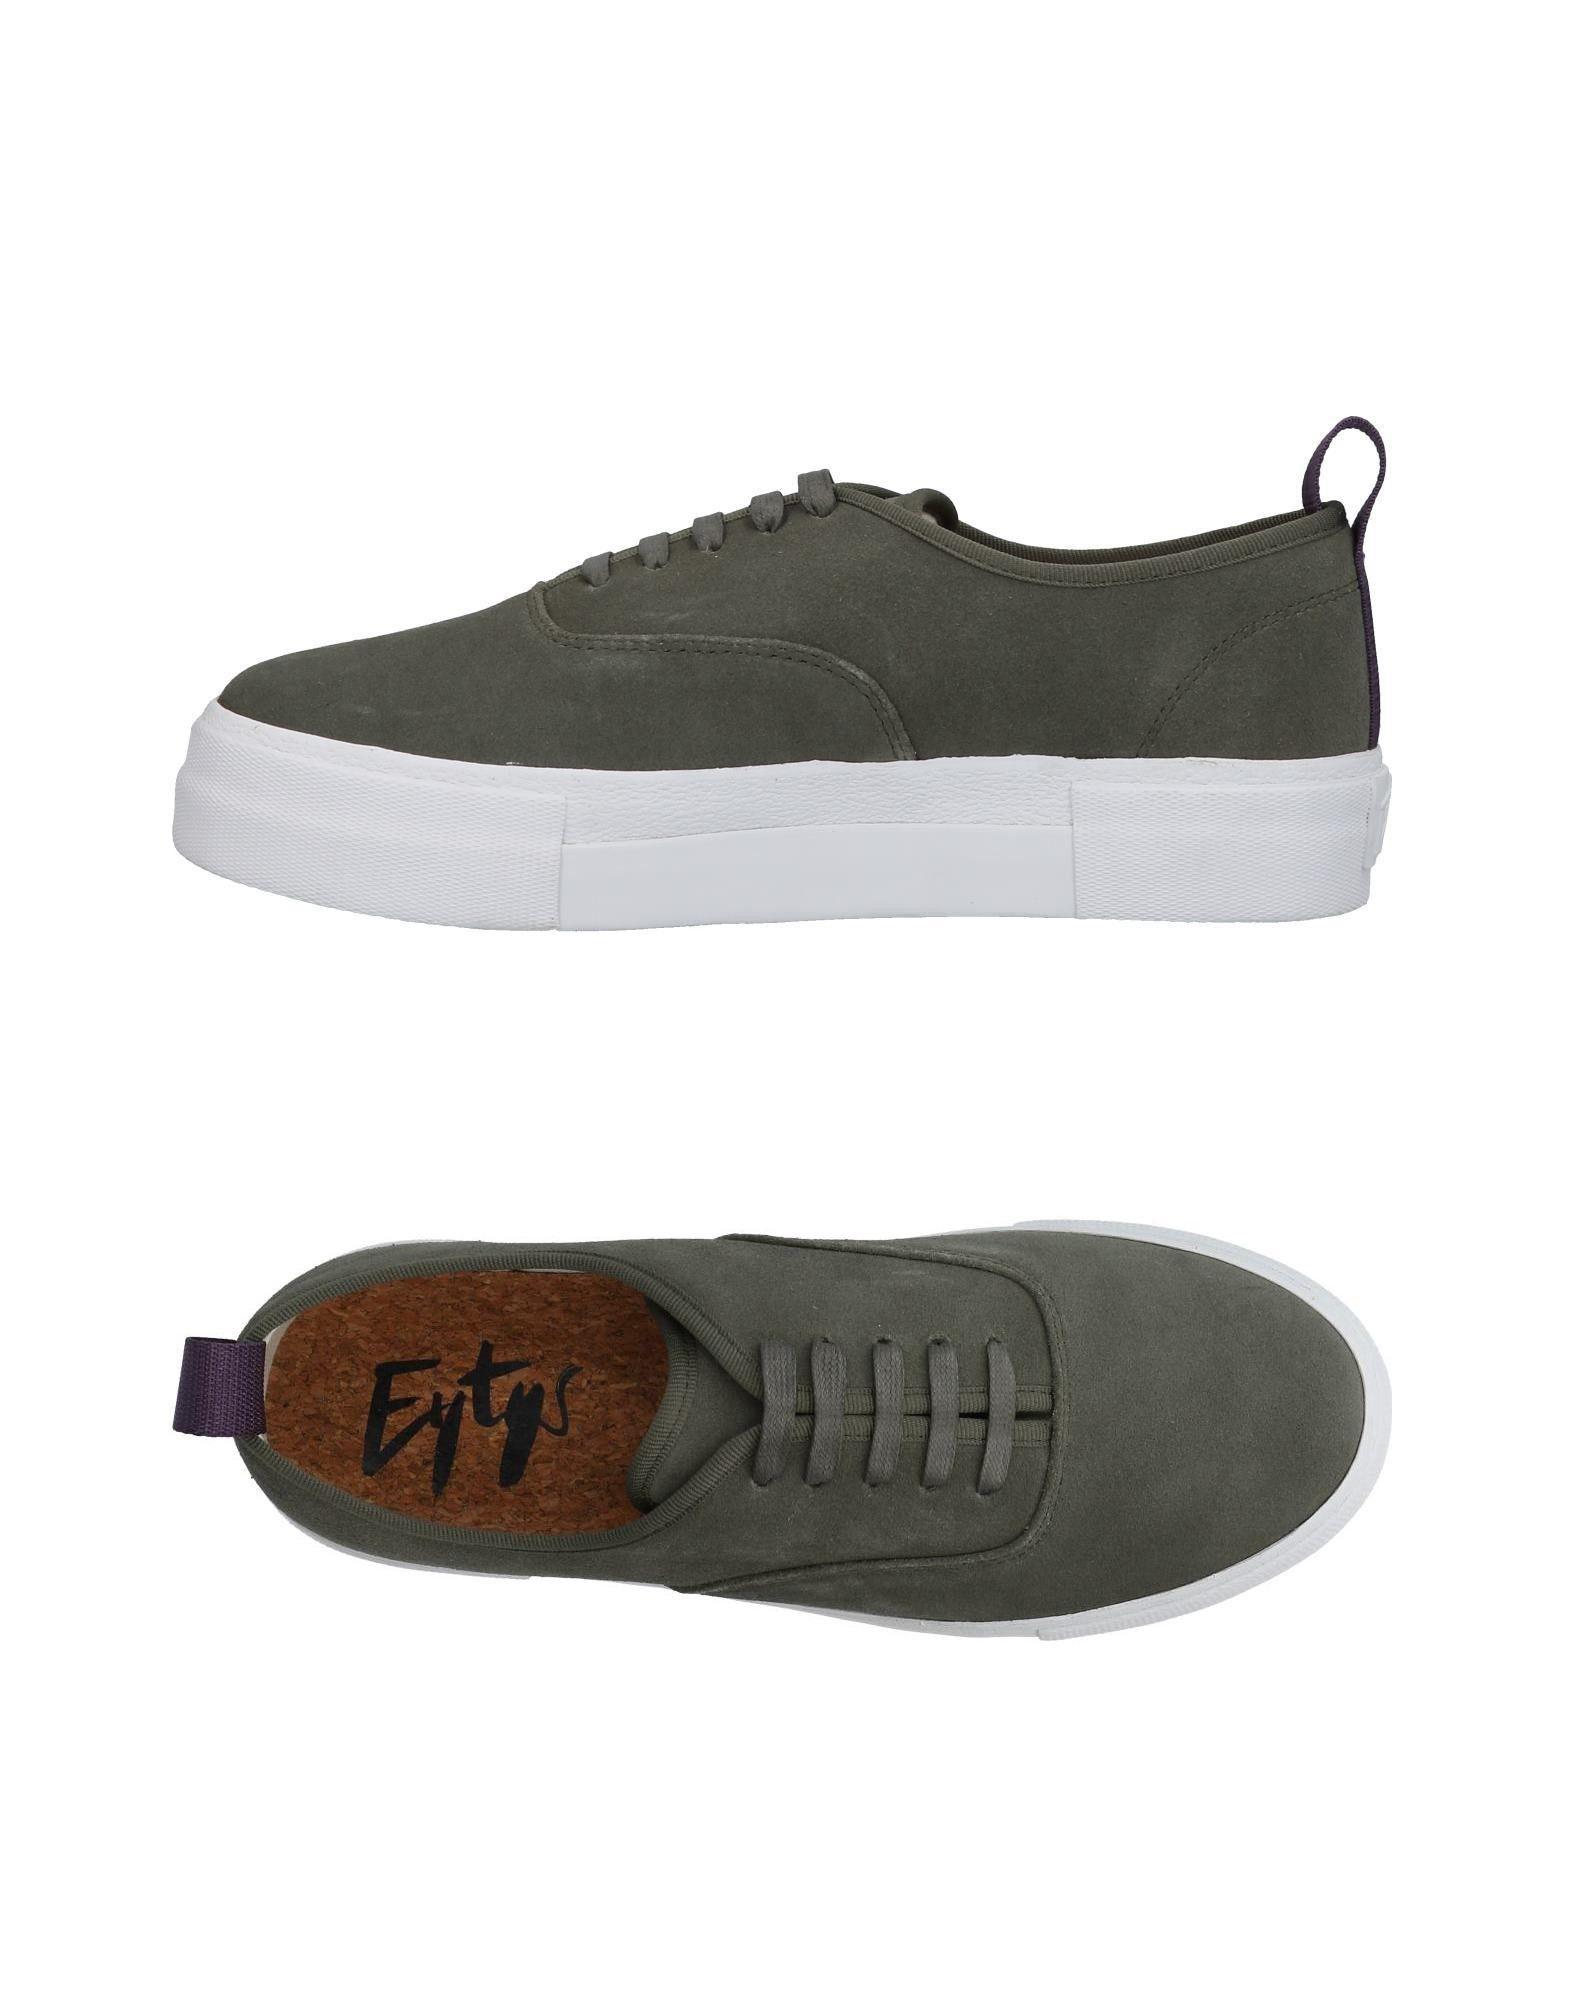 Sneakers Eytys Homme - Sneakers Eytys  Vert militaire Mode pas cher et belle